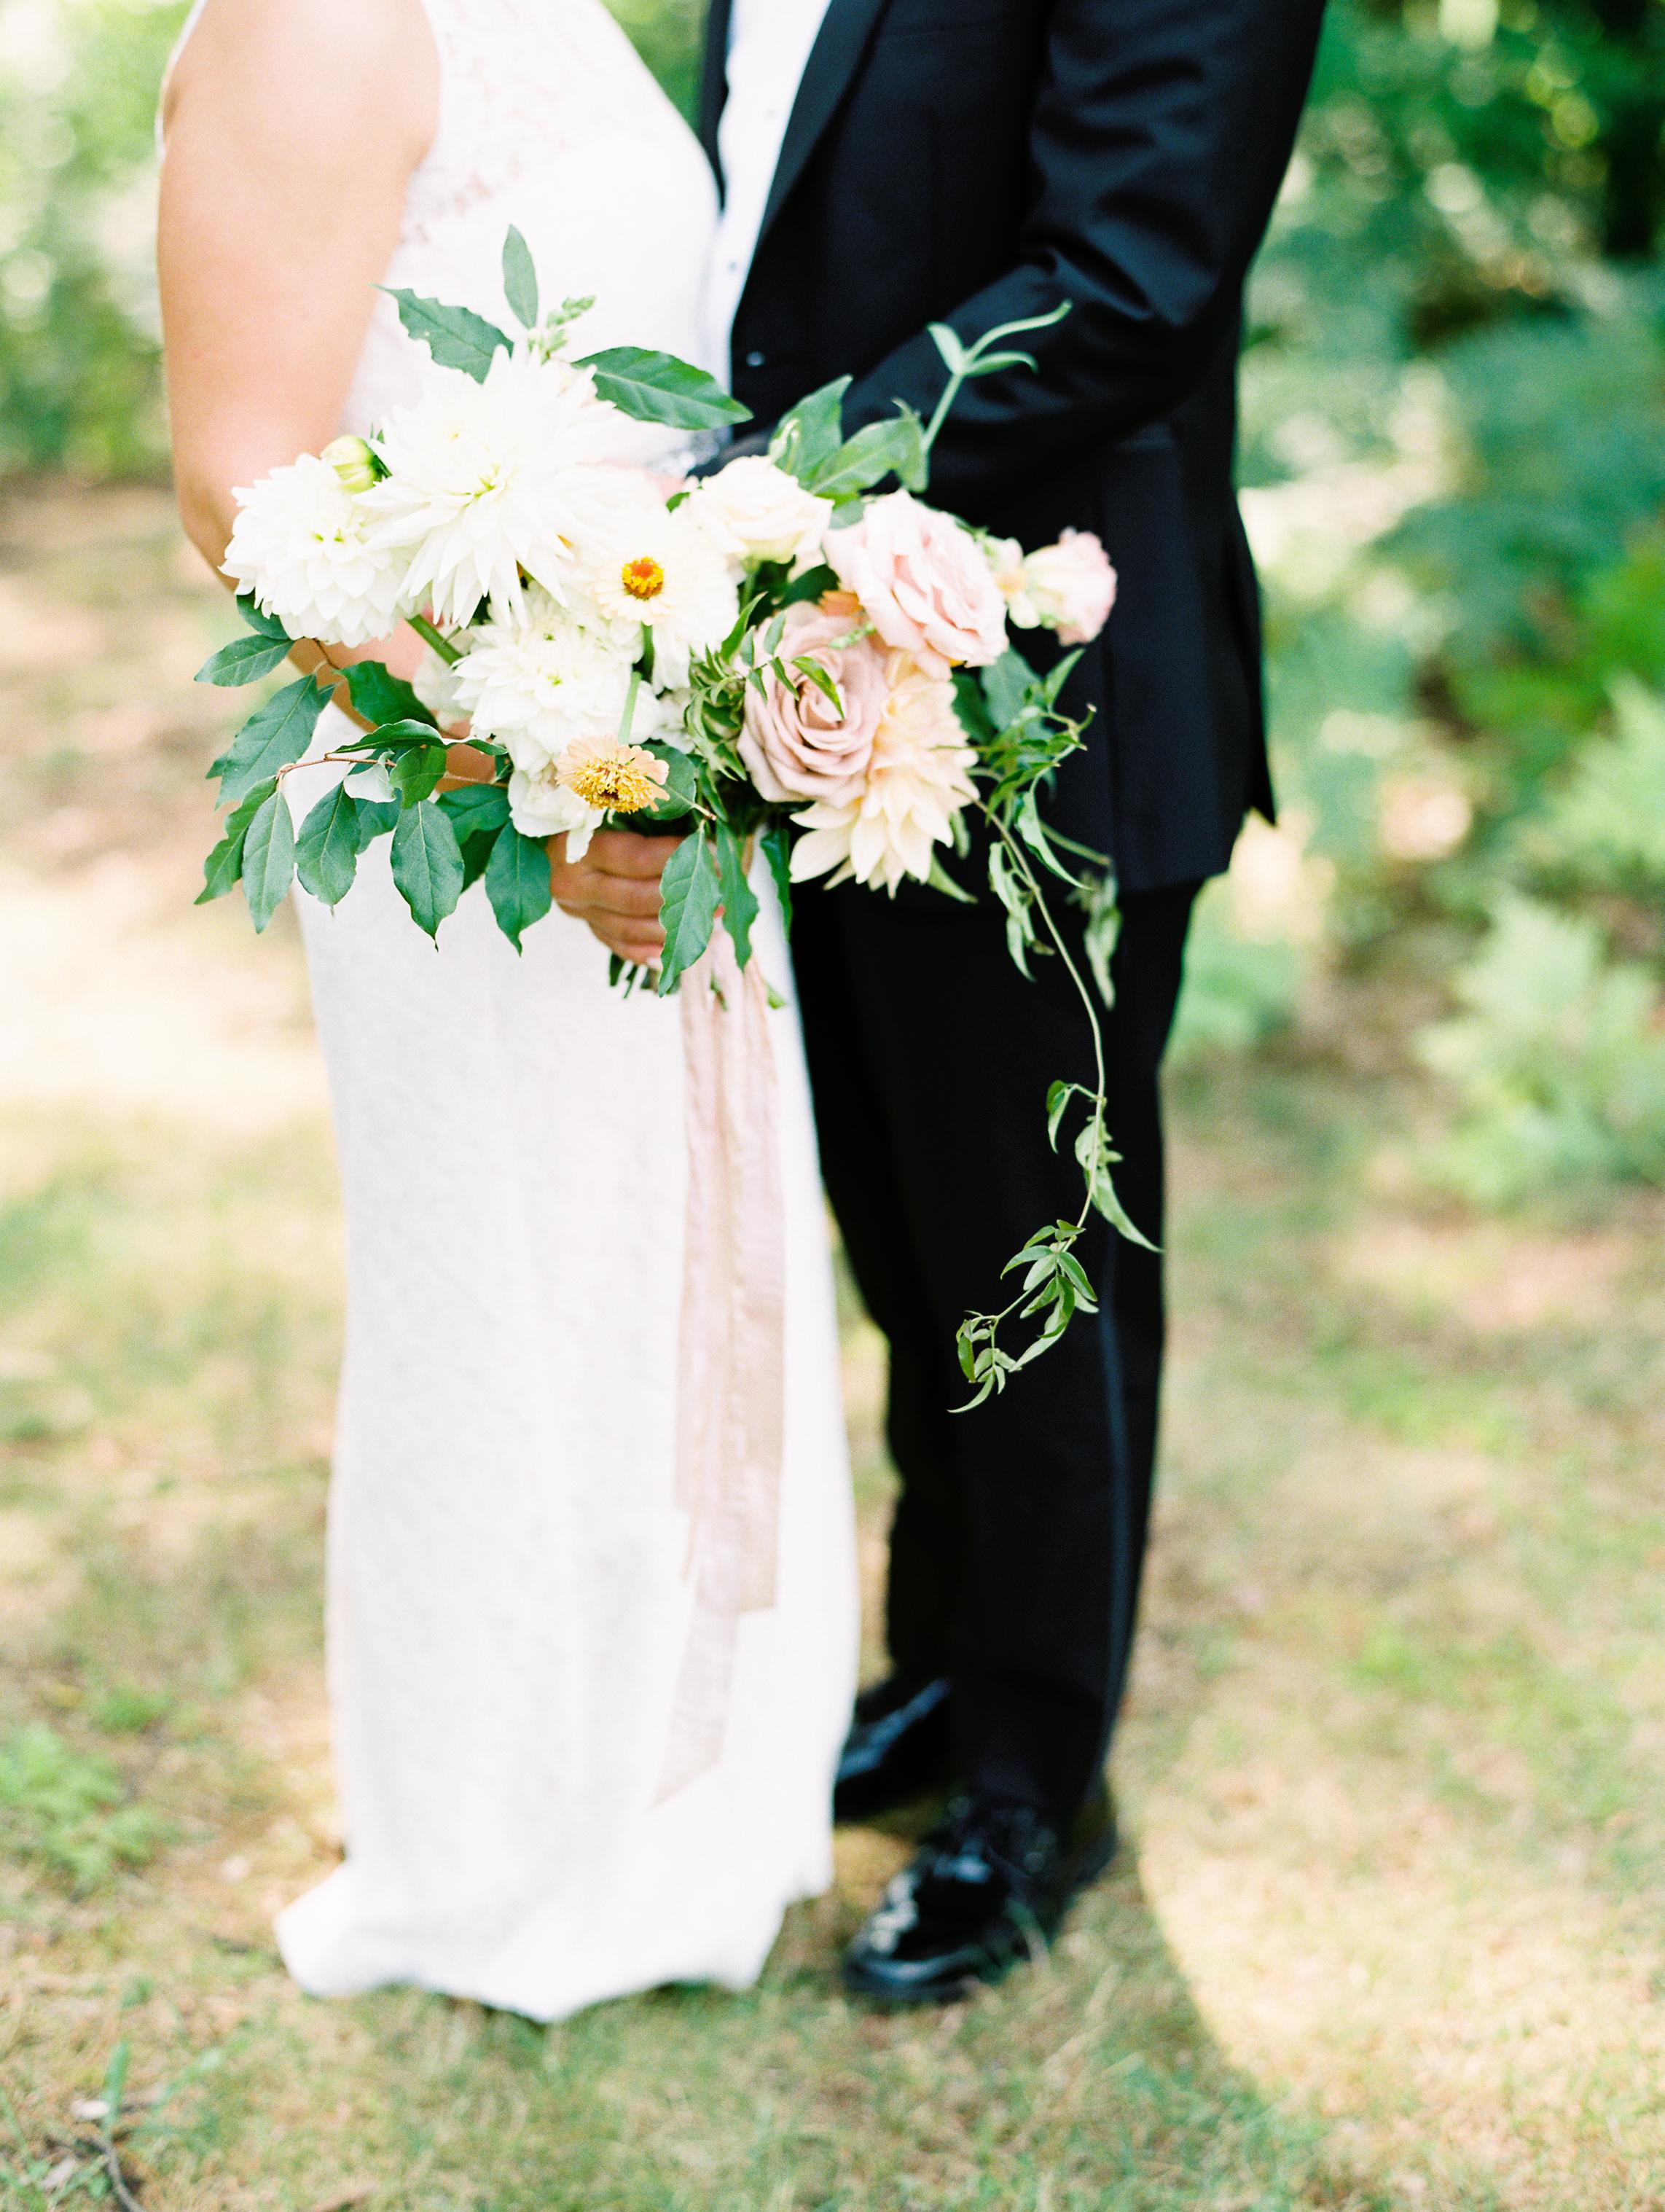 Zoller+Wedding+Bridal+Partyf-50.jpg